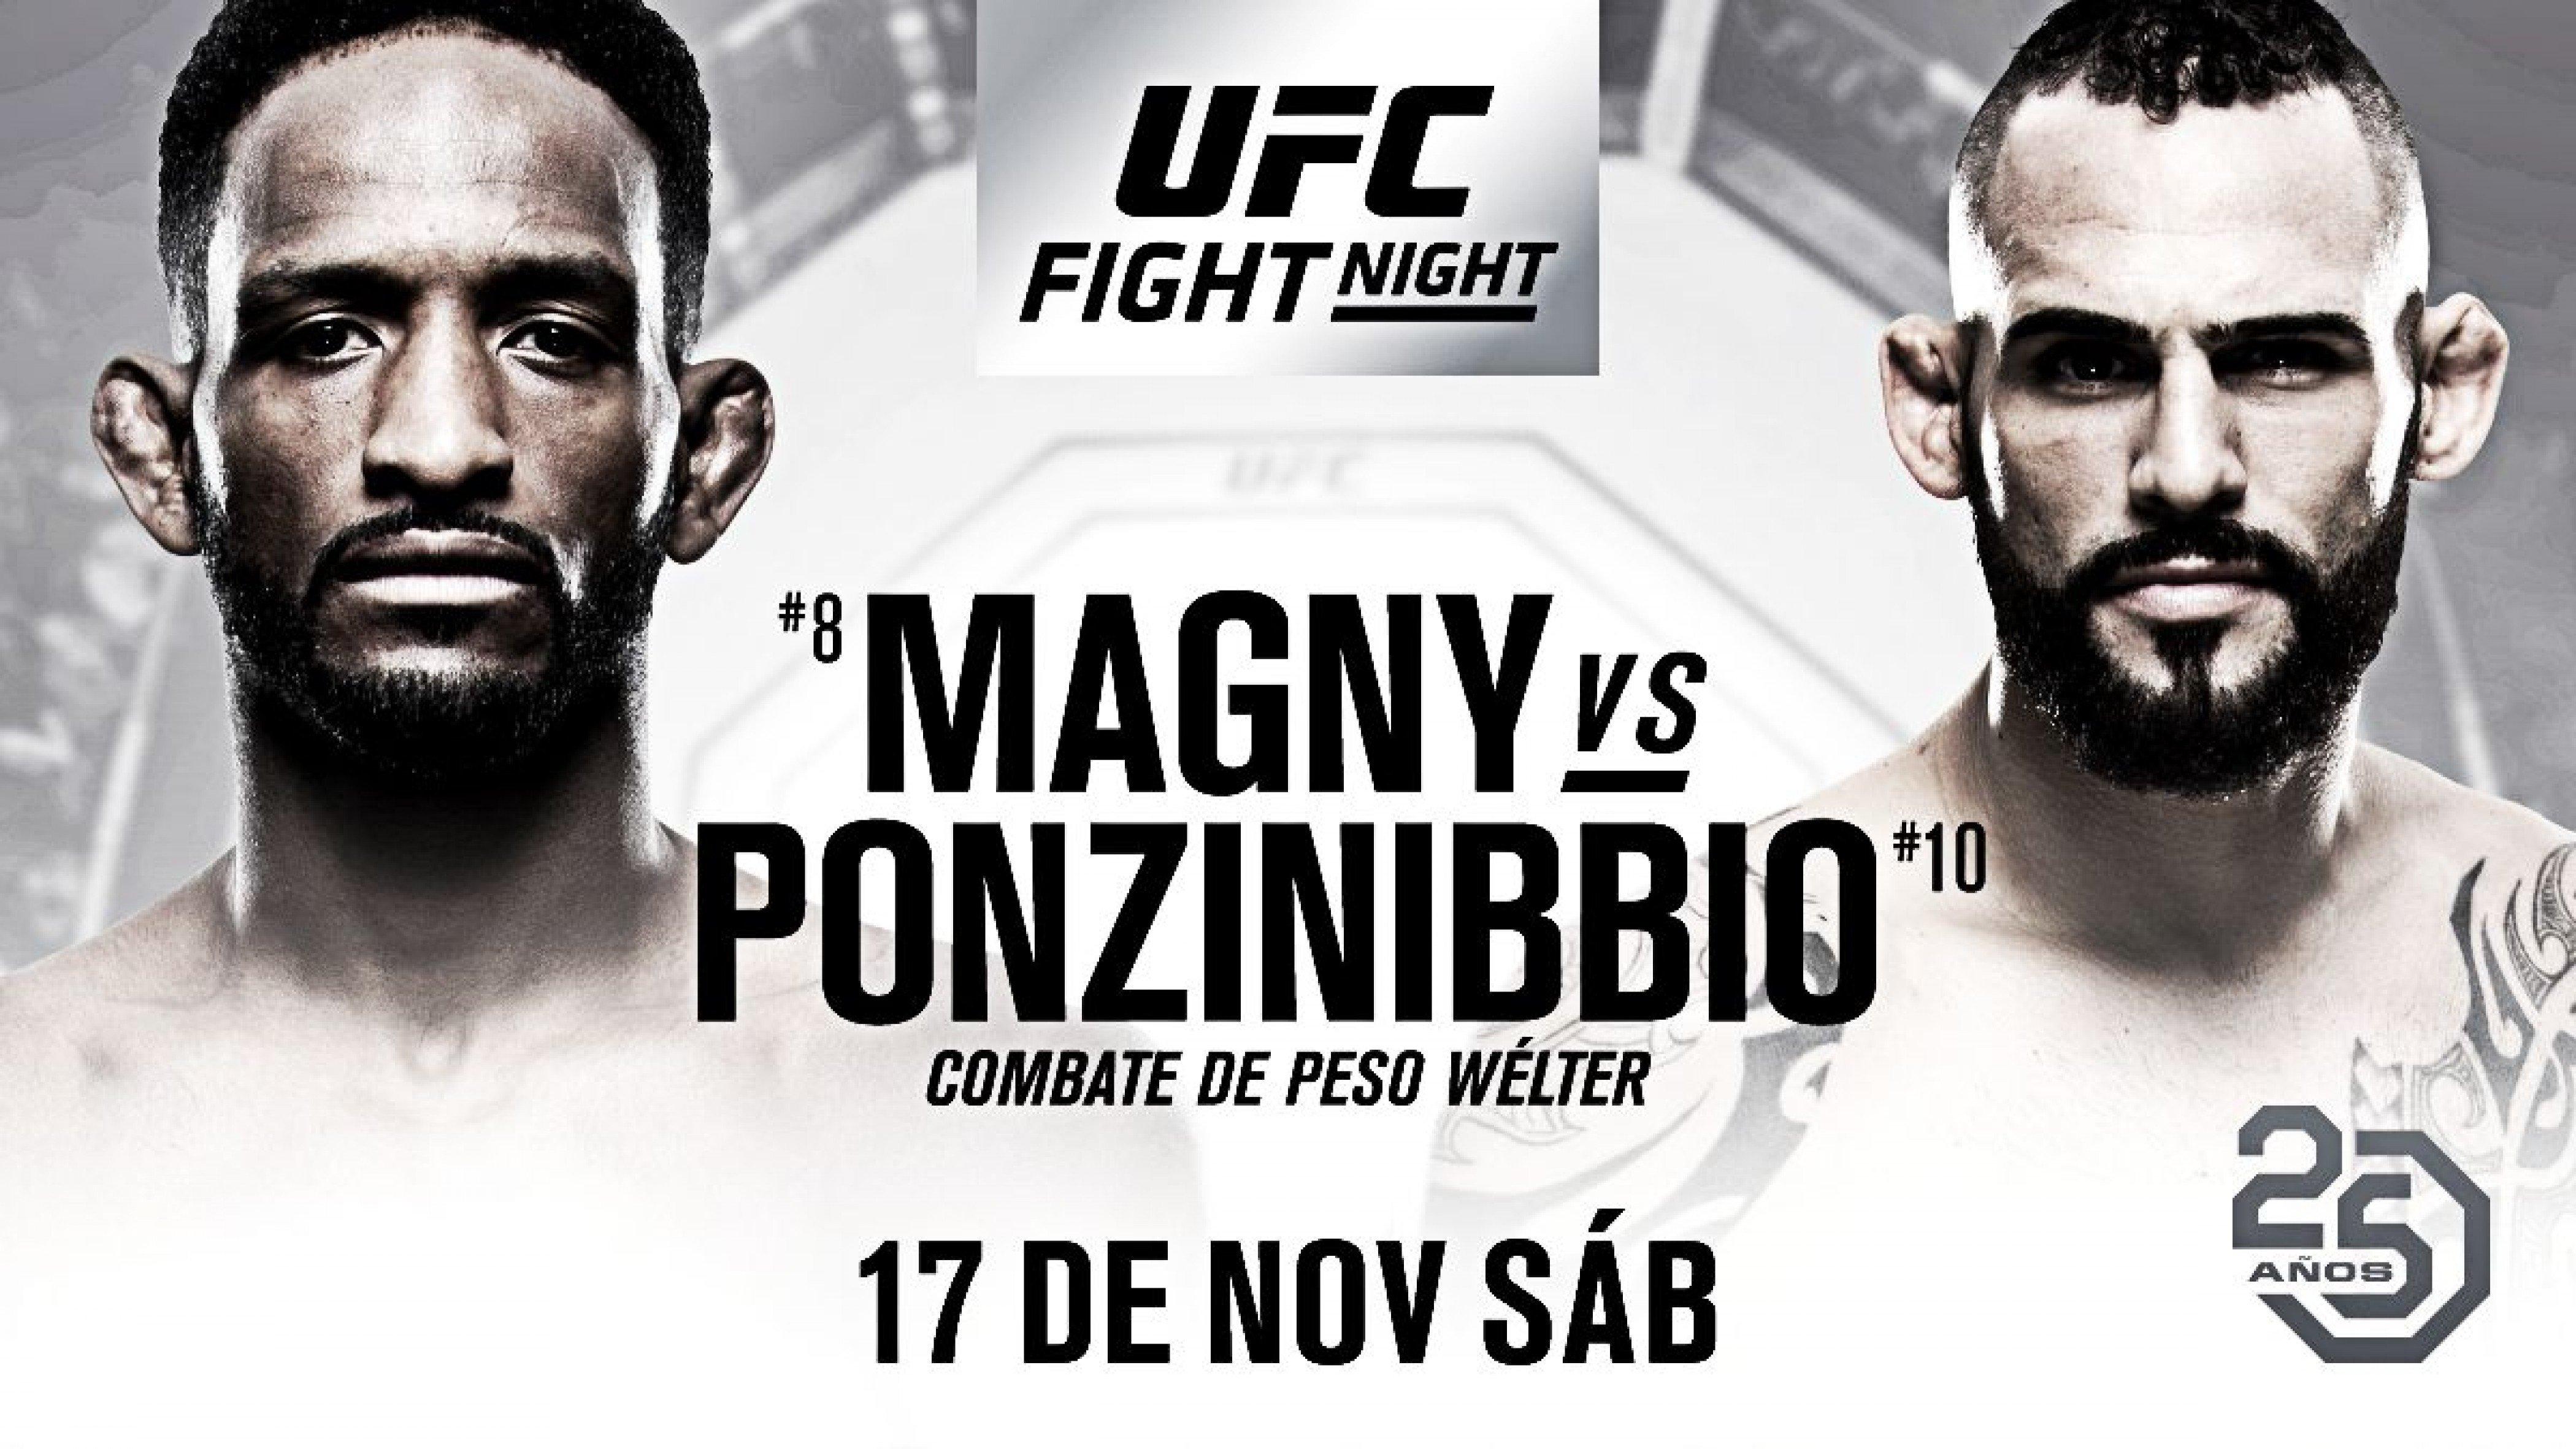 Llega oficialmente UFC a Argentina